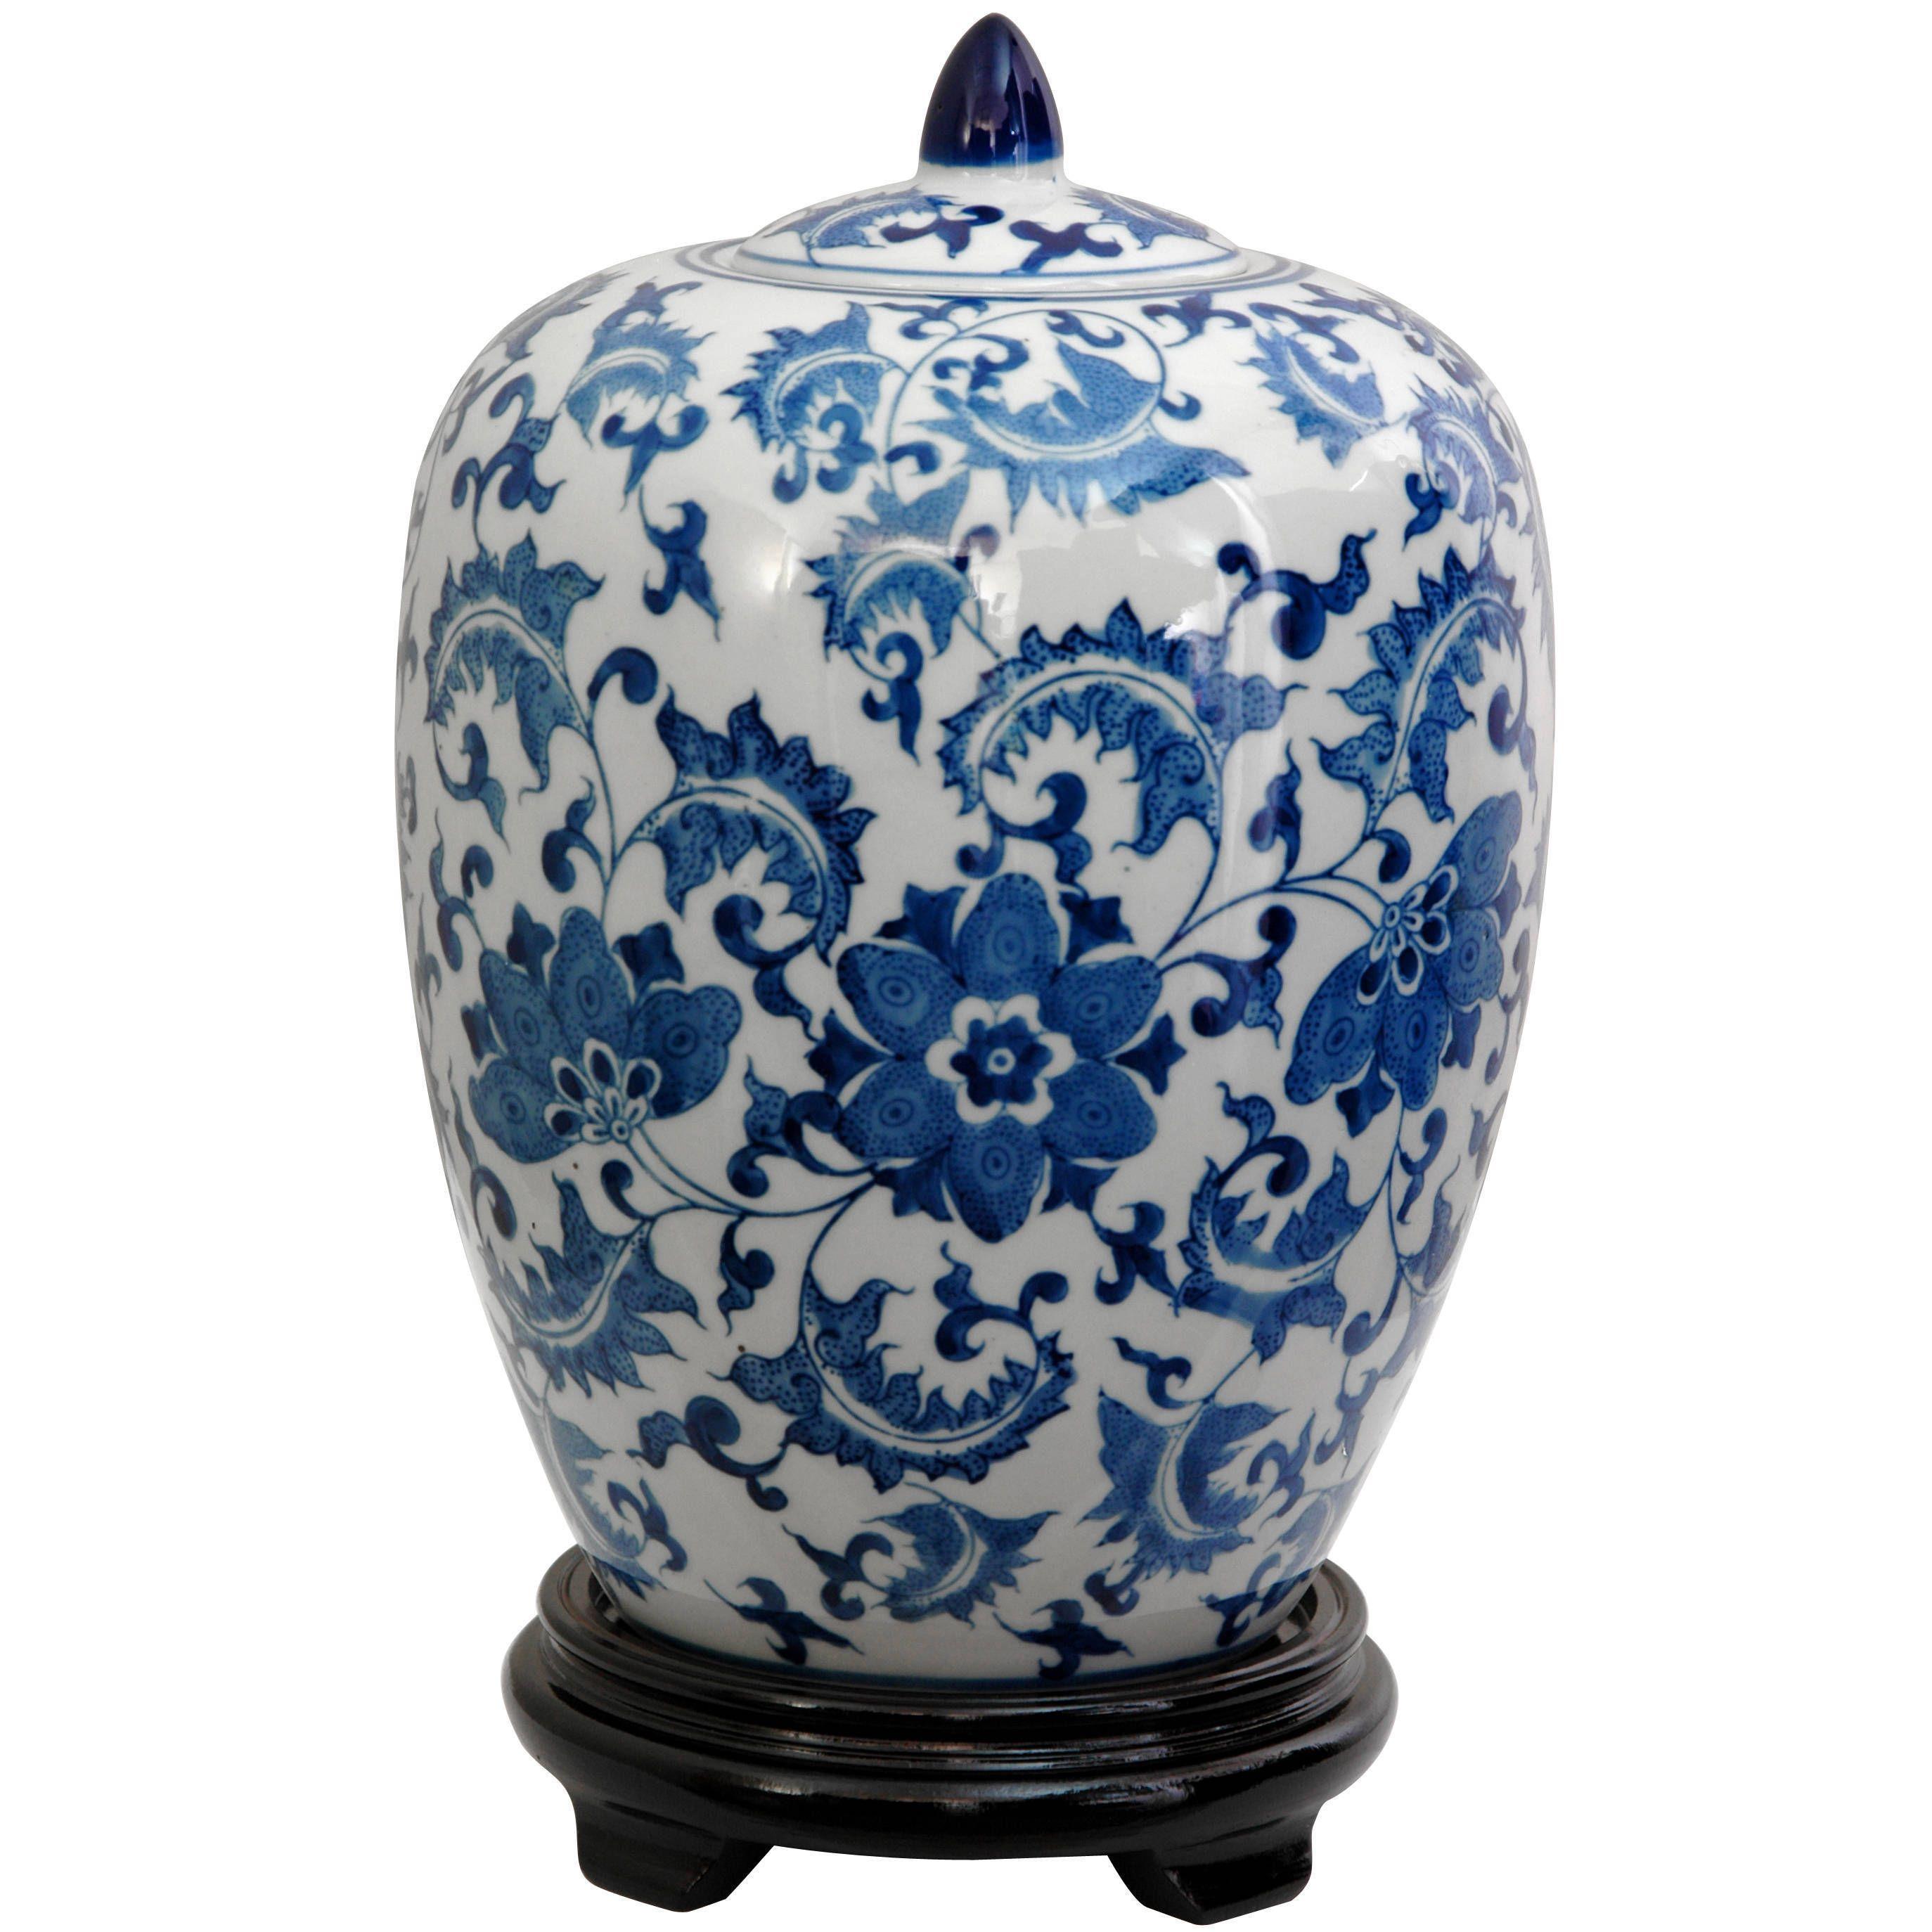 Handmade Porcelain 12 Inch Blue And White Fl Vase Jar